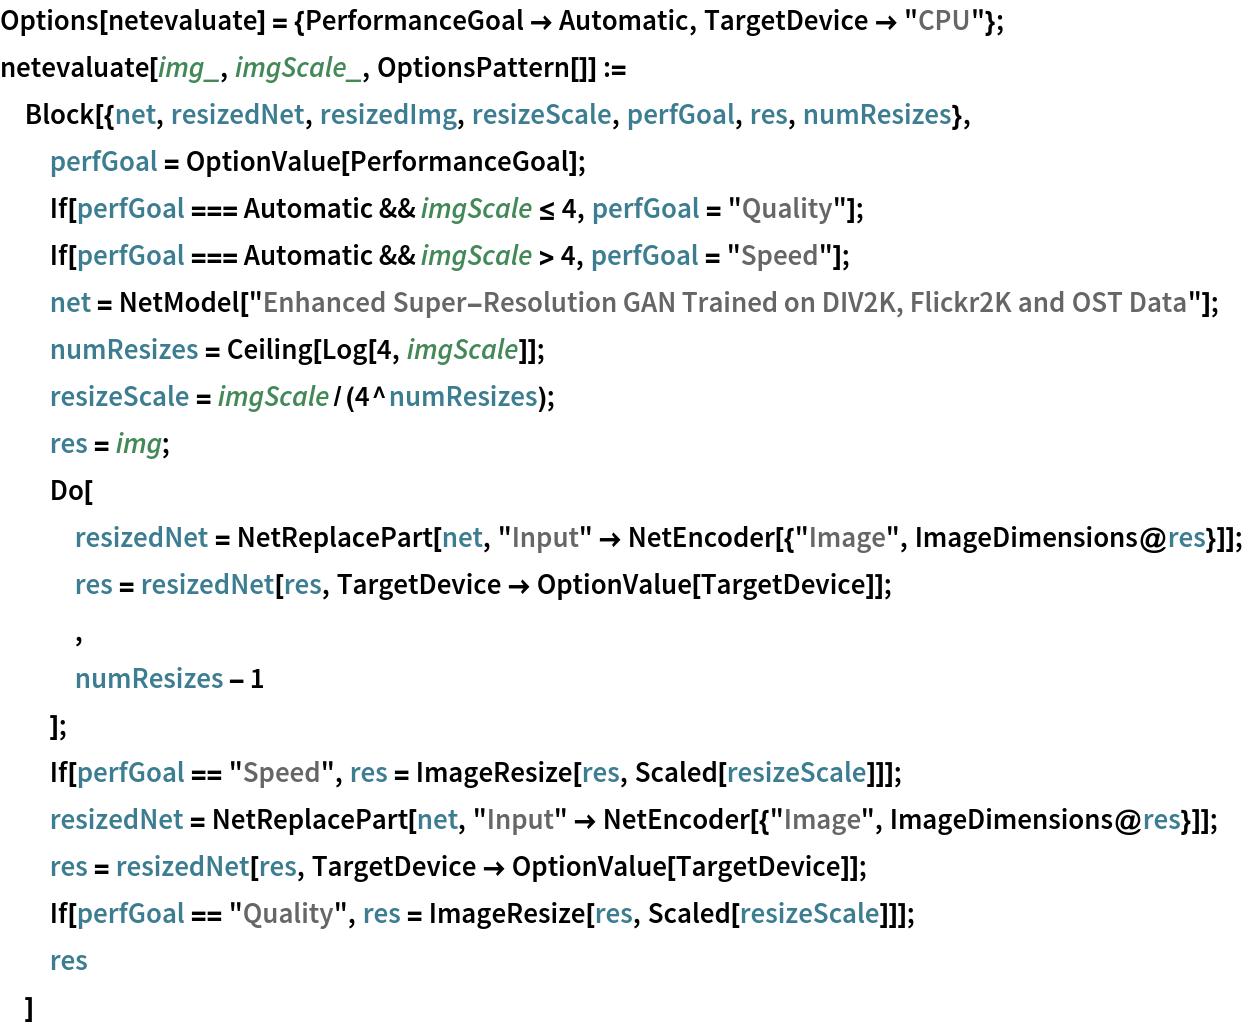 "Options[netevaluate] = {PerformanceGoal -> Automatic, TargetDevice -> ""CPU""}; netevaluate[img_, imgScale_, OptionsPattern[]] := Block[{net, resizedNet, resizedImg, resizeScale, perfGoal, res, numResizes},   perfGoal = OptionValue[PerformanceGoal];   If[perfGoal === Automatic && imgScale <= 4, perfGoal = ""Quality""];   If[perfGoal === Automatic && imgScale > 4, perfGoal = ""Speed""];   net = NetModel[     ""Enhanced Super-Resolution GAN Trained on DIV2K, Flickr2K and OST \ Data""];   numResizes = Ceiling[Log[4, imgScale]];   resizeScale = imgScale/(4^numResizes);   res = img;   Do[    resizedNet = NetReplacePart[net, ""Input"" -> NetEncoder[{""Image"", ImageDimensions@res}]];    res = resizedNet[res, TargetDevice -> OptionValue[TargetDevice]];    ,    numResizes - 1    ];   If[perfGoal == ""Speed"", res = ImageResize[res, Scaled[resizeScale]]];   resizedNet = NetReplacePart[net, ""Input"" -> NetEncoder[{""Image"", ImageDimensions@res}]];   res = resizedNet[res, TargetDevice -> OptionValue[TargetDevice]];   If[perfGoal == ""Quality"", res = ImageResize[res, Scaled[resizeScale]]];   res   ]"